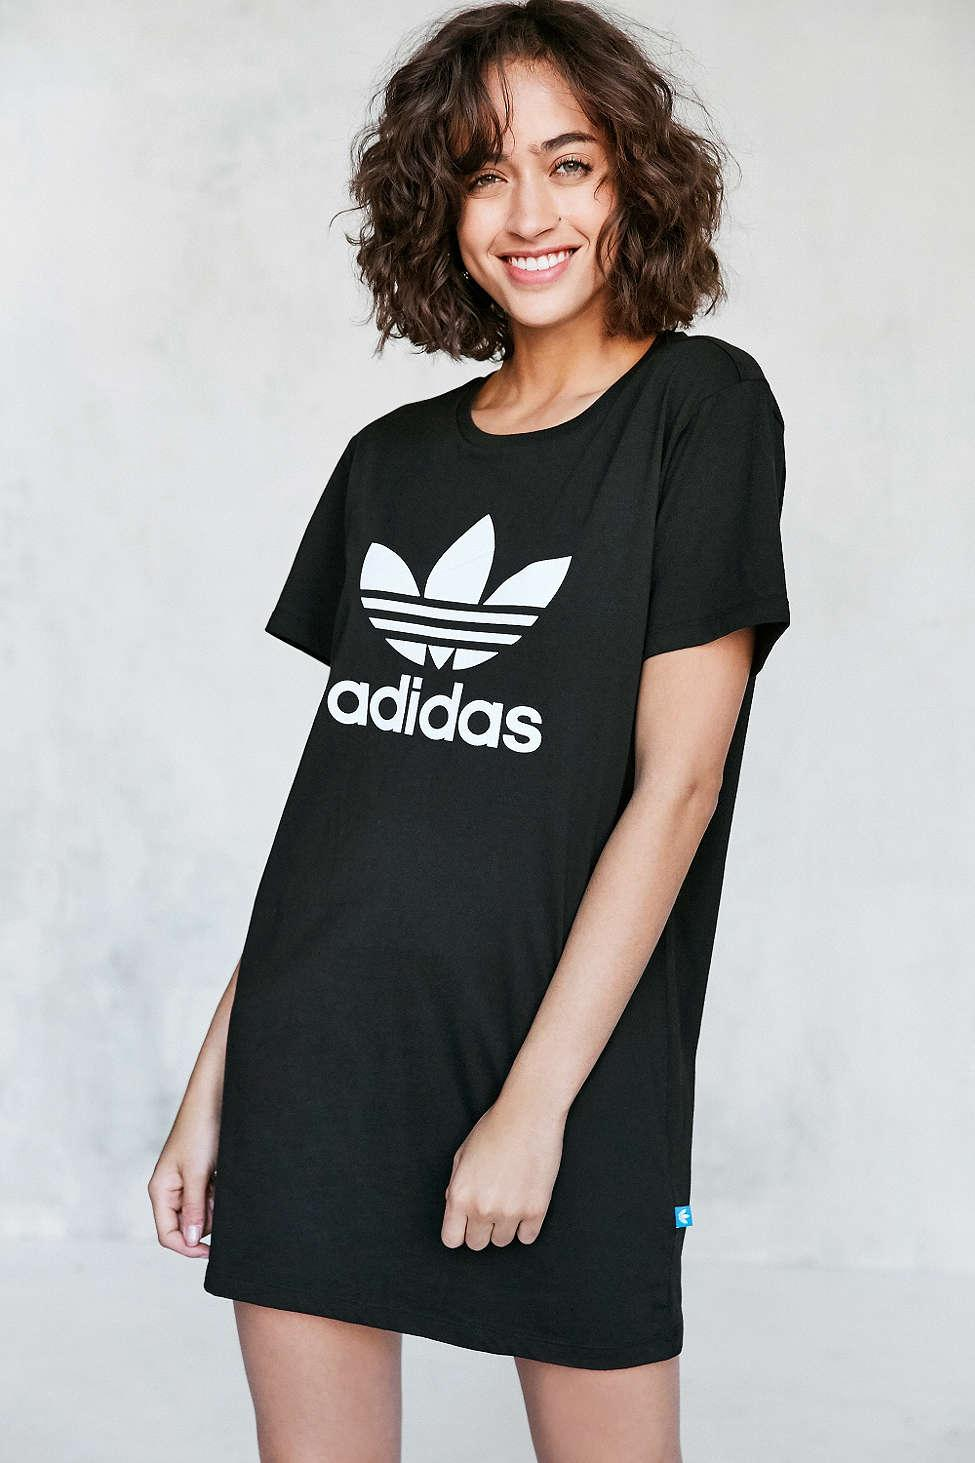 Adidas originals Originals Trefoil Oversized T-shirt Mini Dress in Black | Lyst